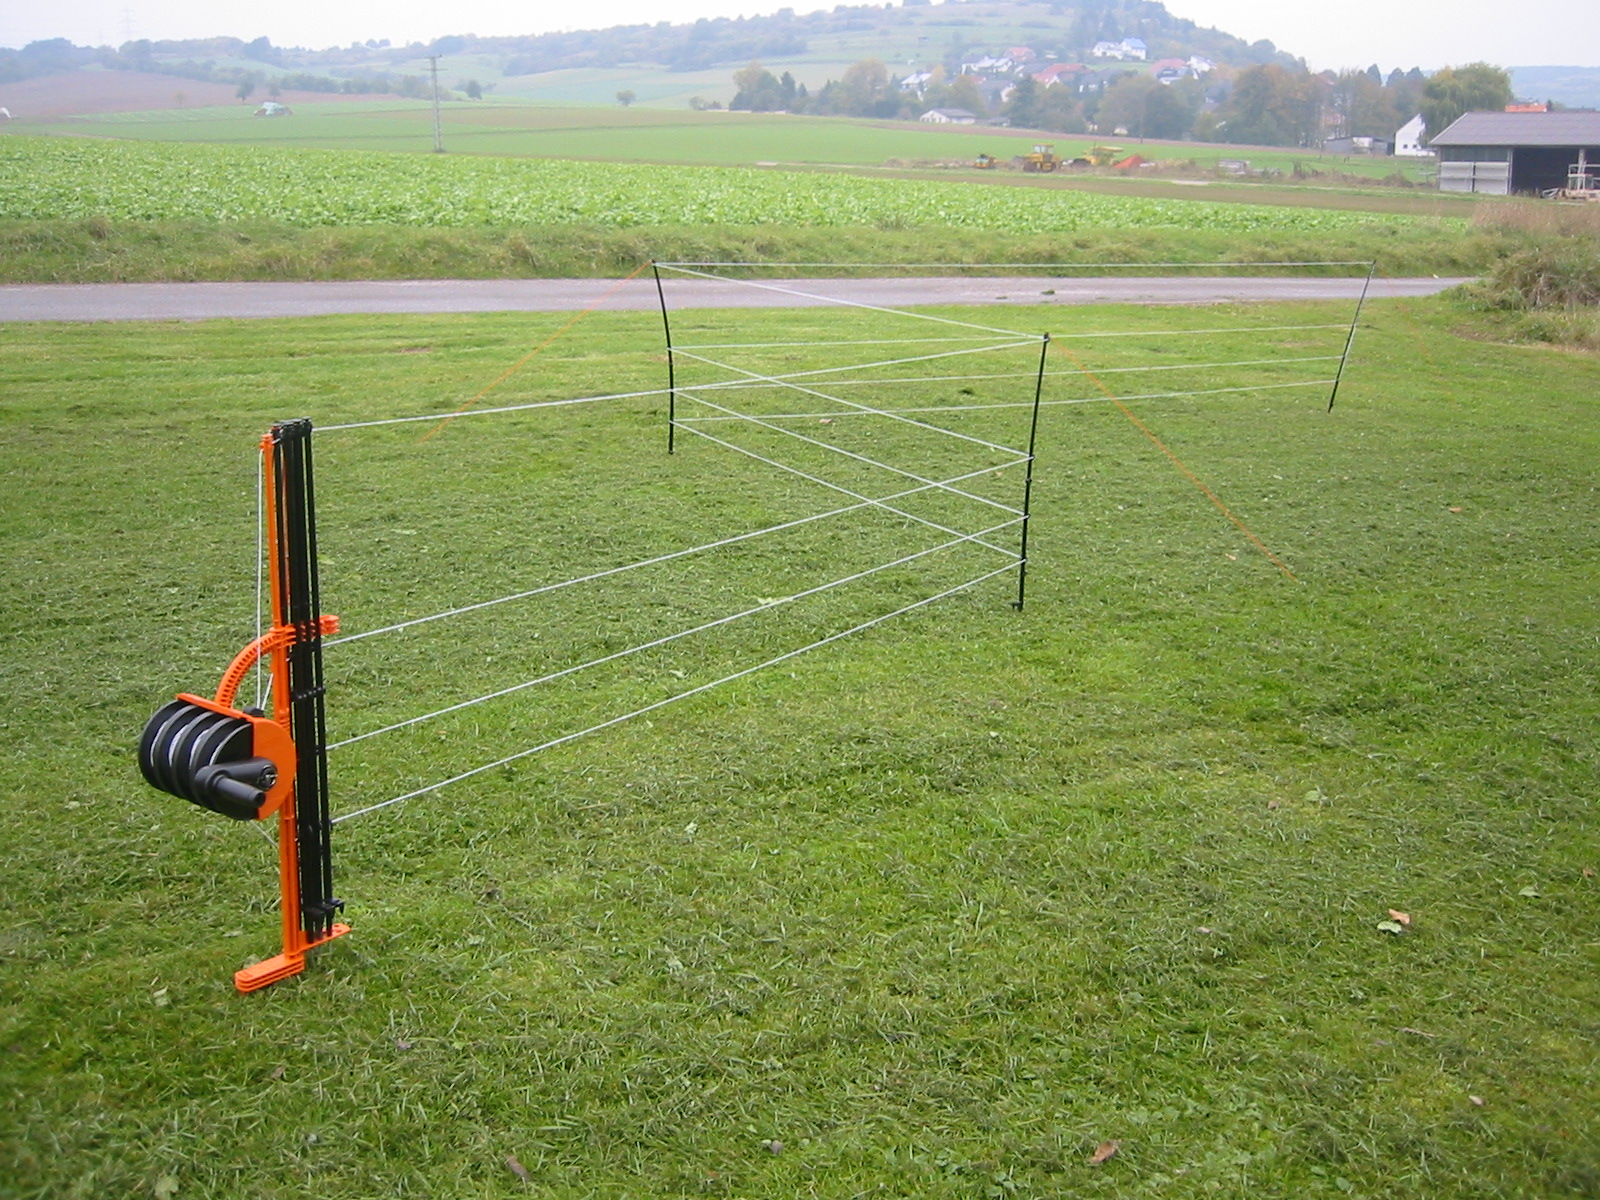 Smart Fence 2.0 Mobilzaun mit 4 Litzen